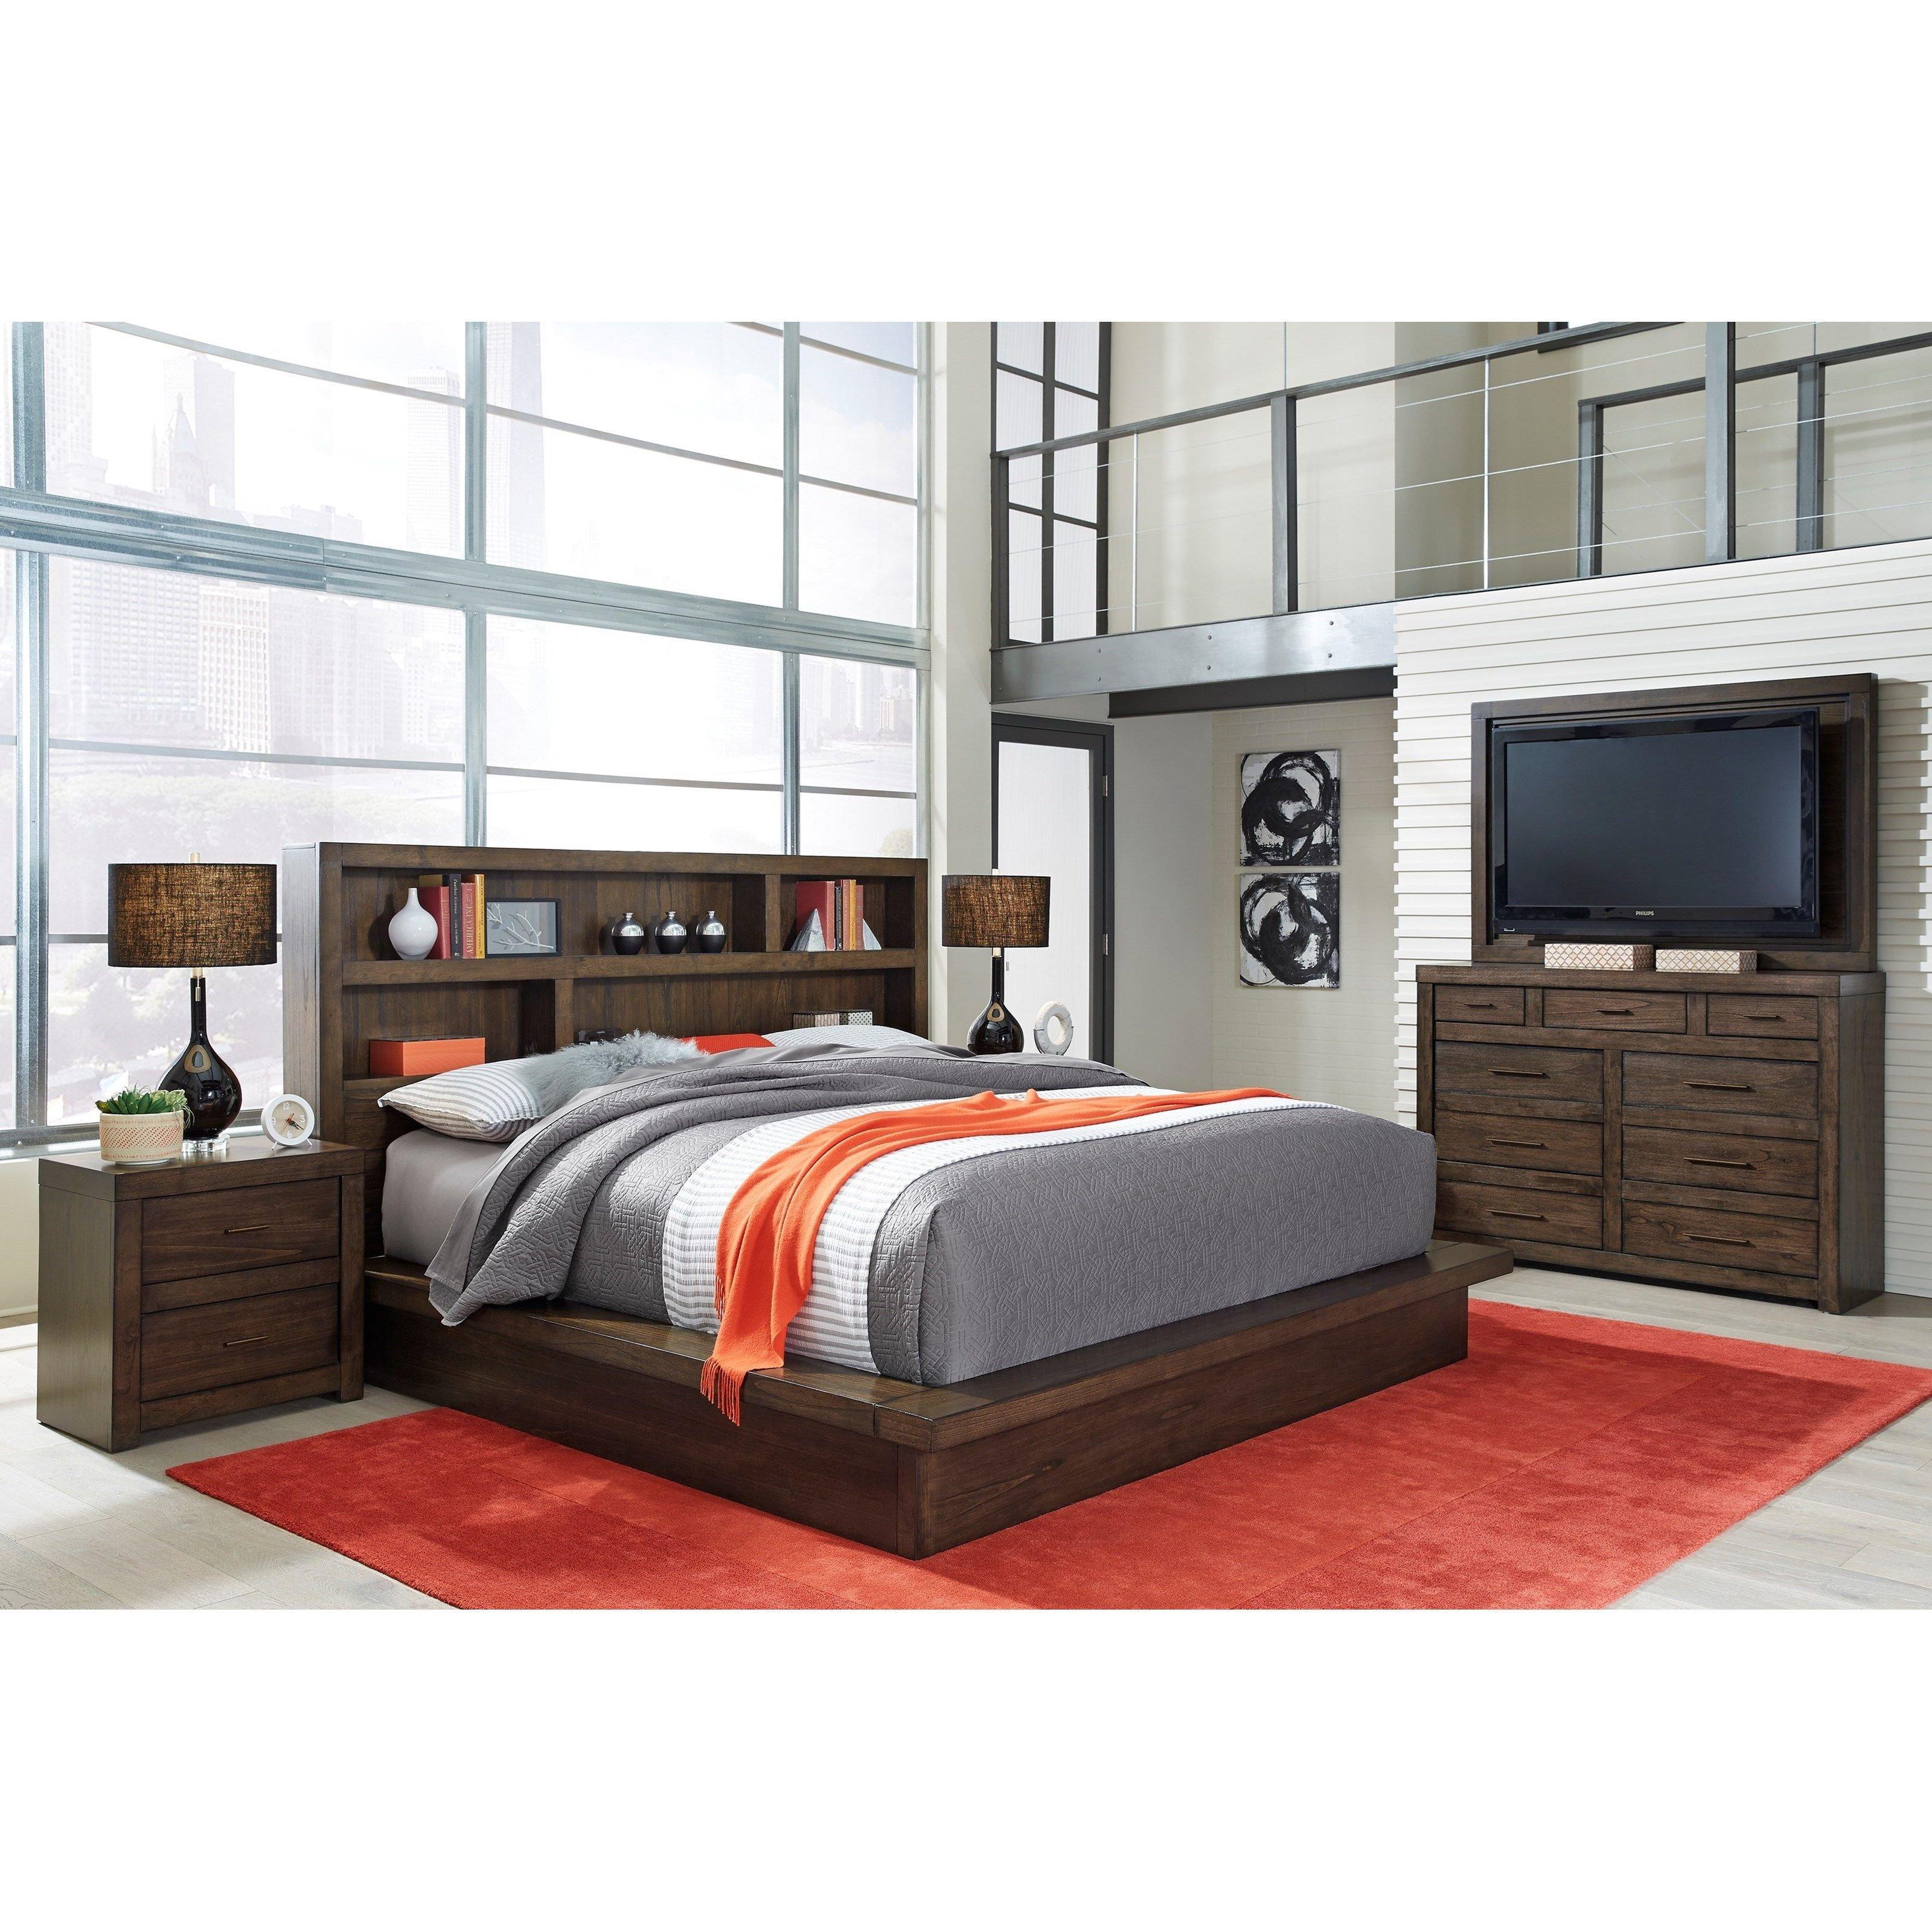 California King Bedroom Set Elegant Modern Loft California King Bedroom Group by aspenhome